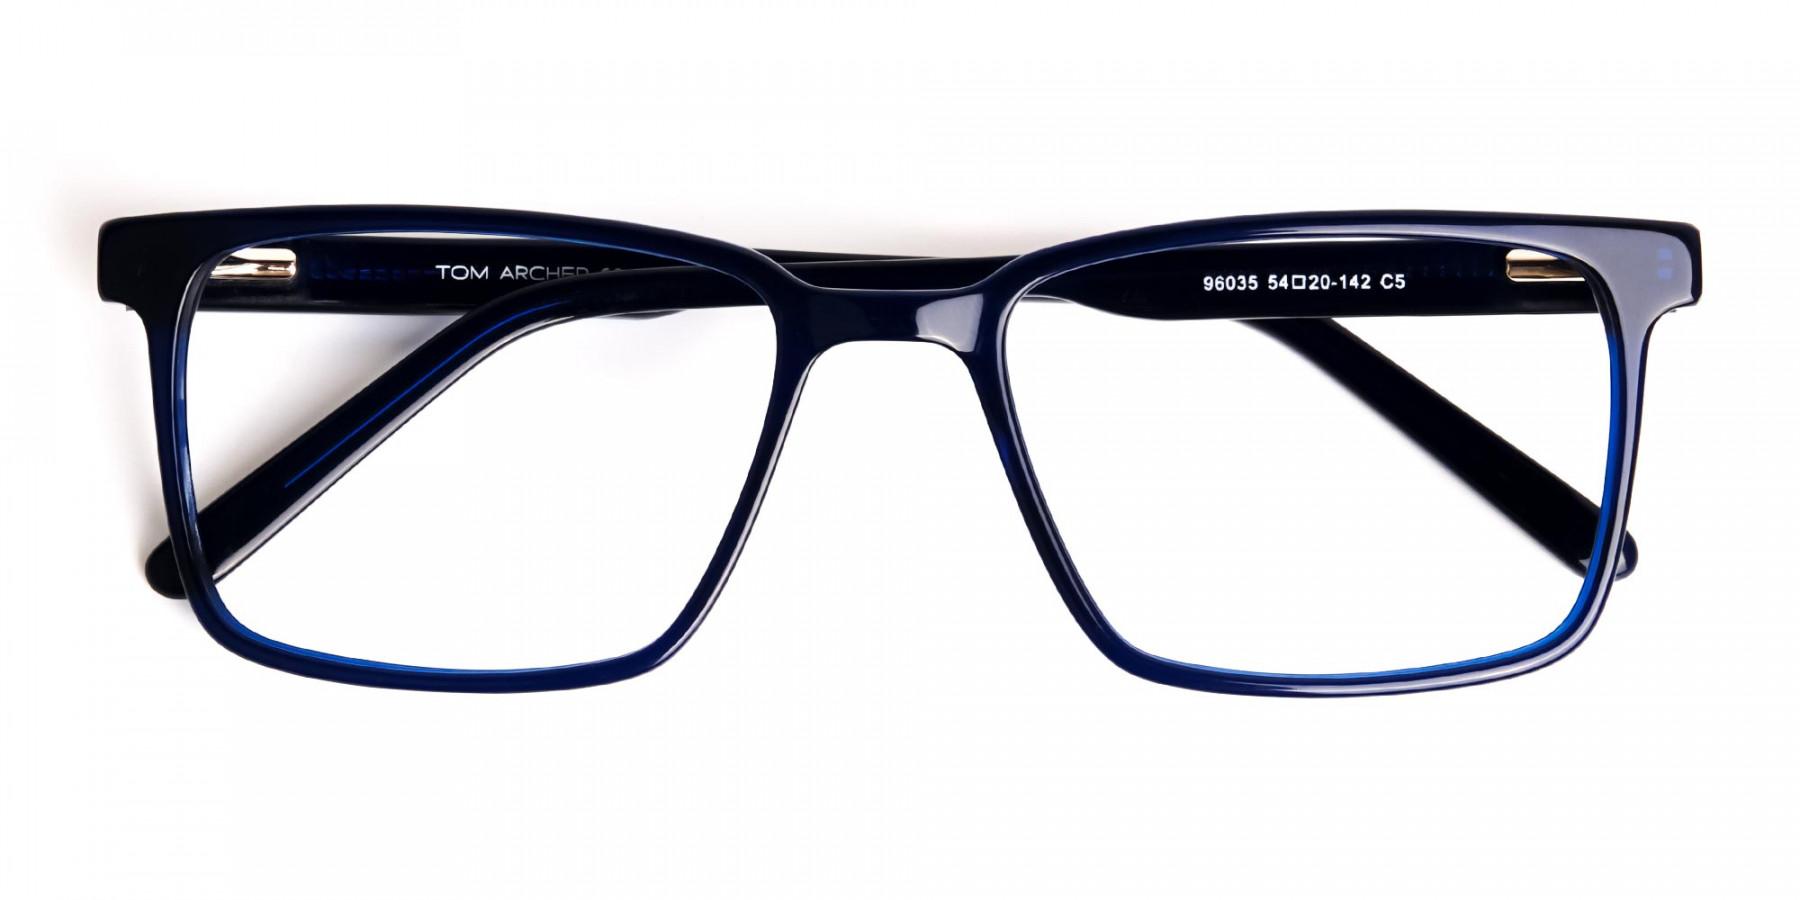 Black-and-Indigo-Blue-Rectangular-Glasses-frames-1